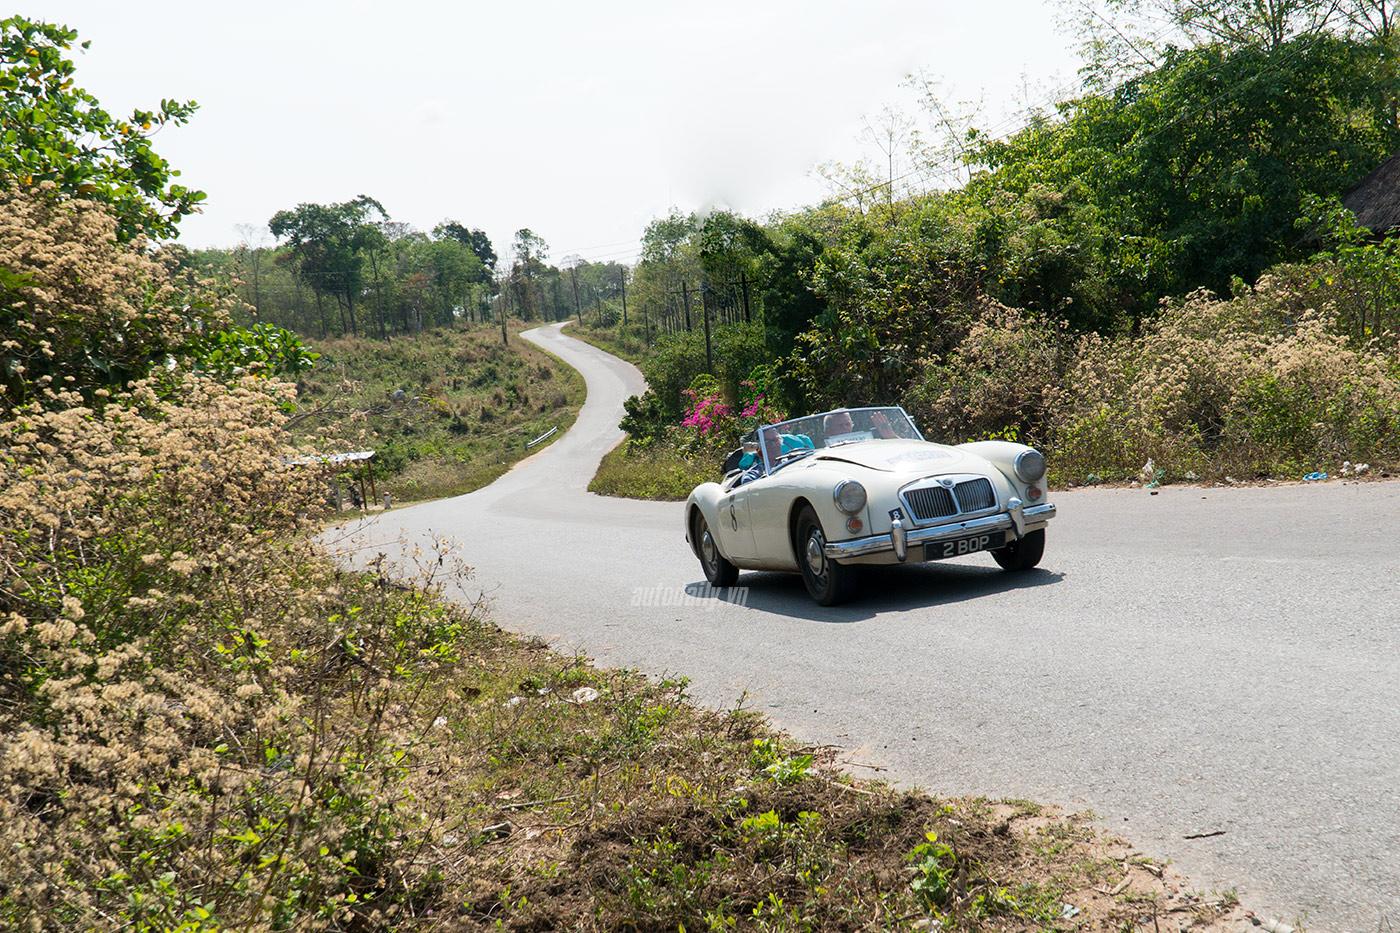 the-road-to-saigon-2018-autodaily-013-2.jpg